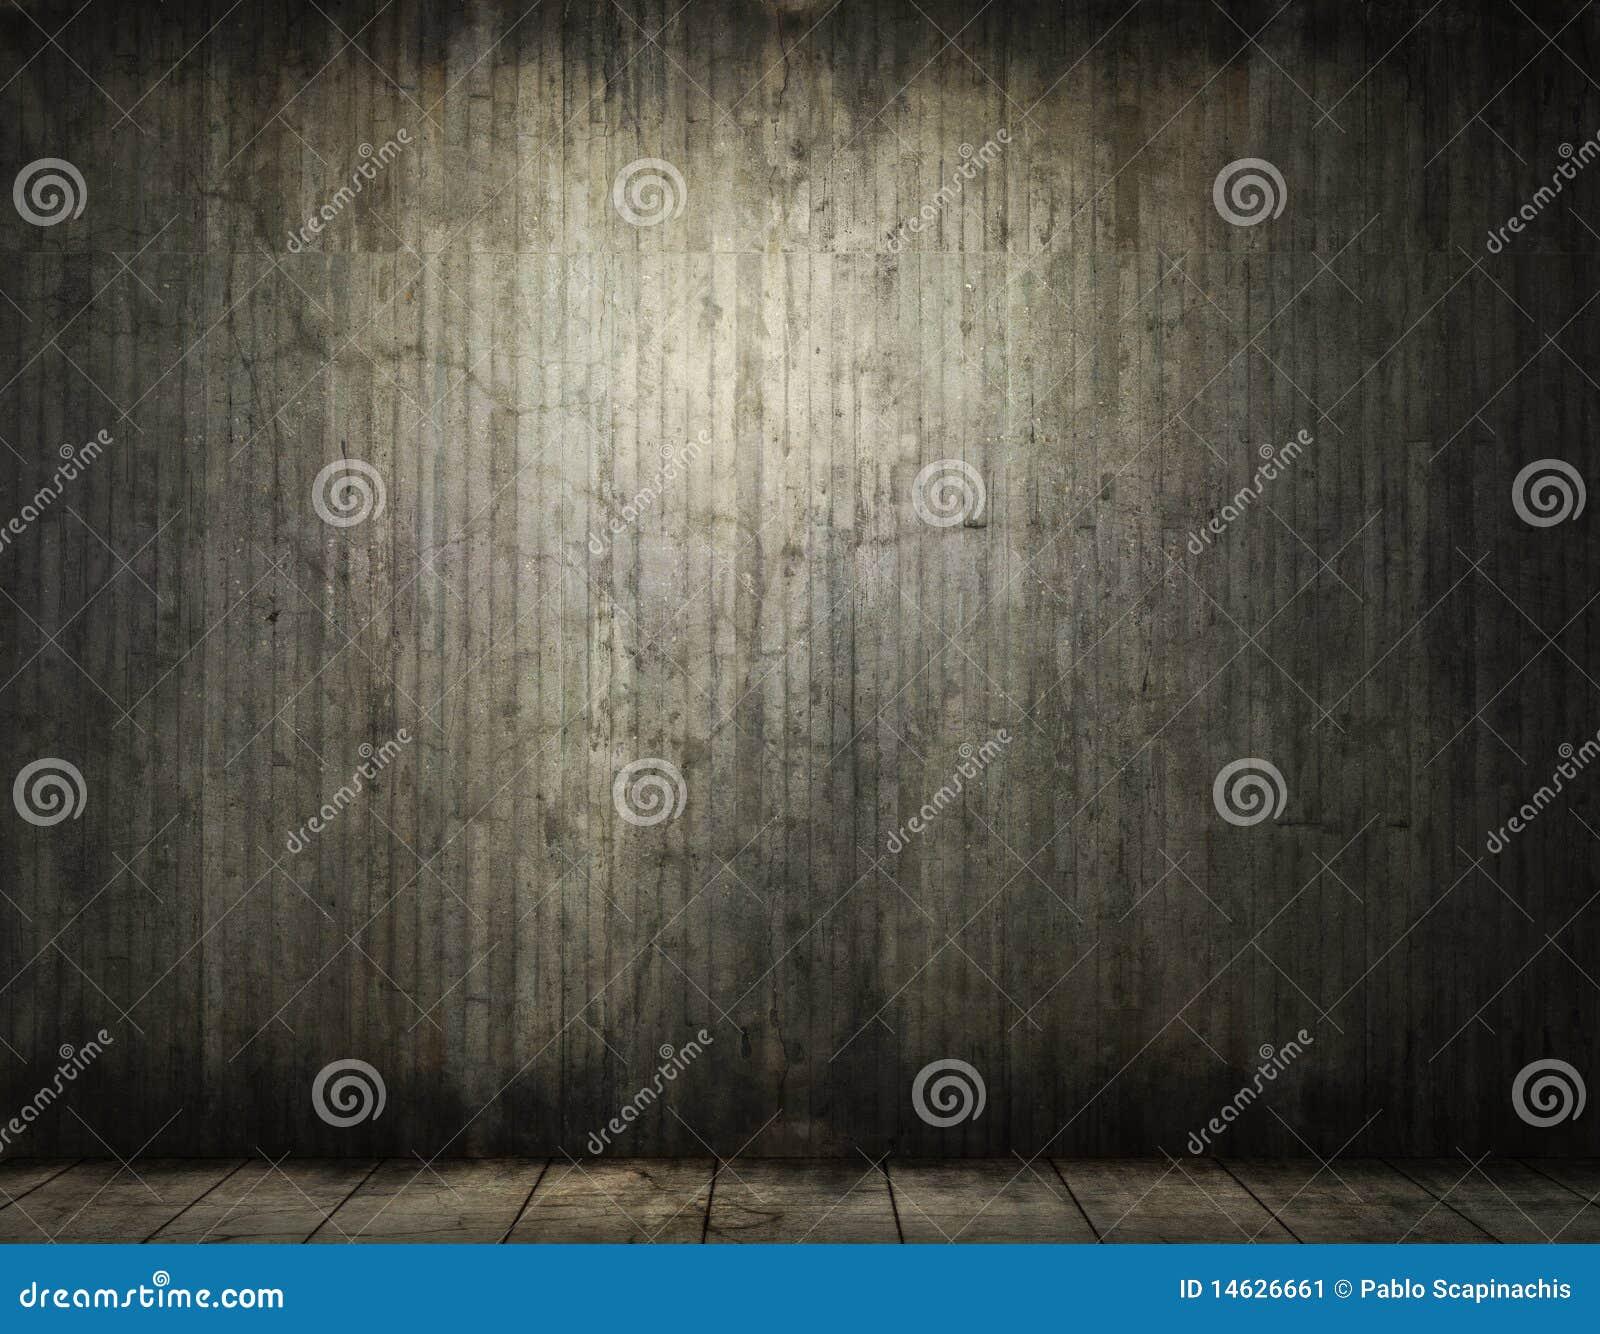 Grungy conrete room background